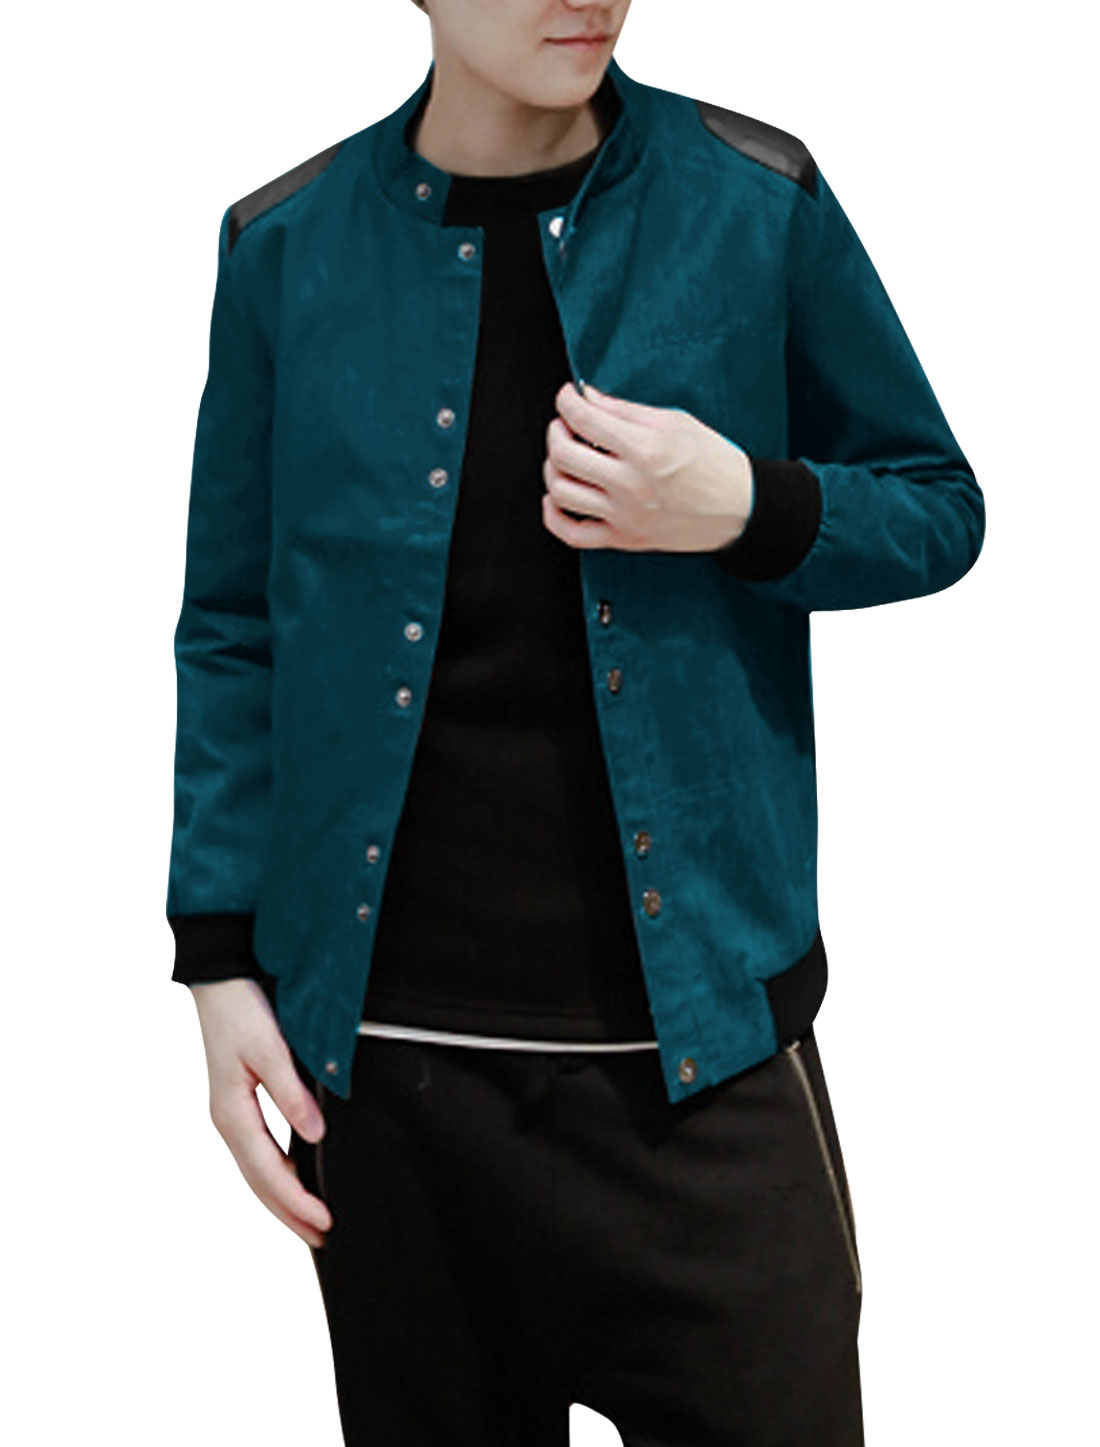 Men Snap Button Up Long Sleeve Plaids Lining Jacket Dark Turquoise M